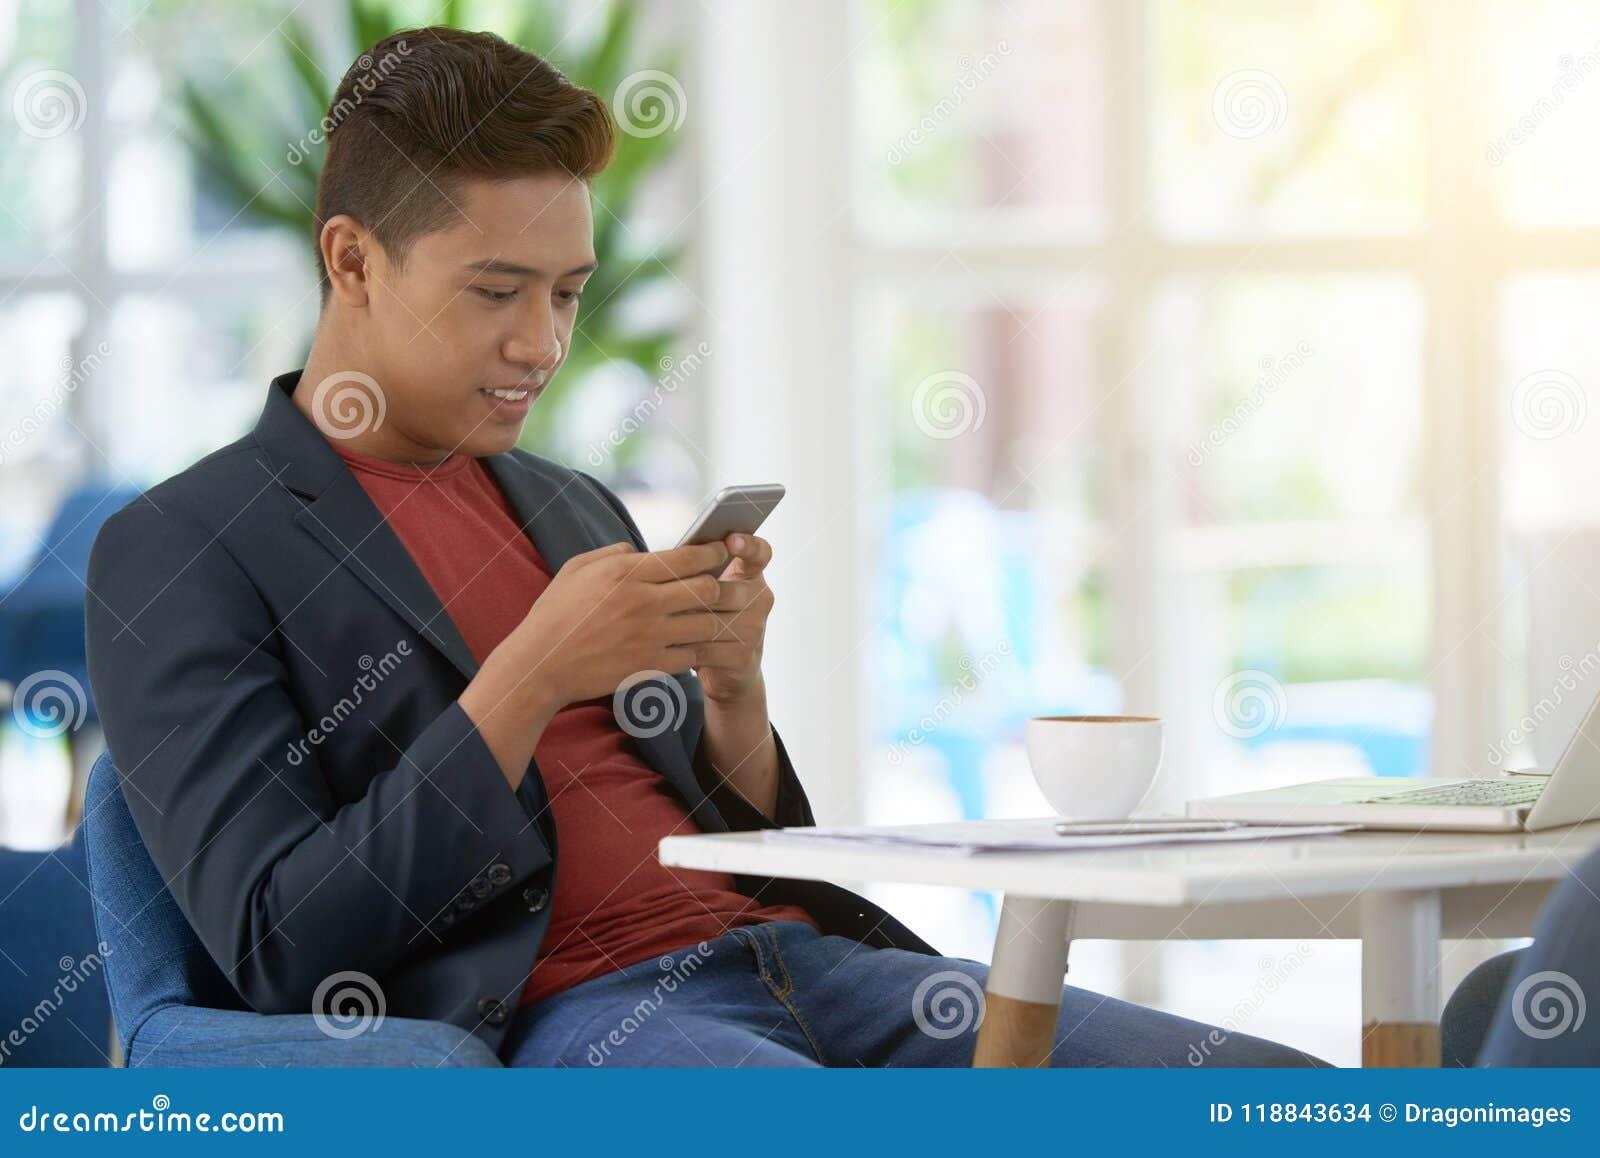 Take Break Coffeebreak : White collar worker taking coffee break stock photo image of